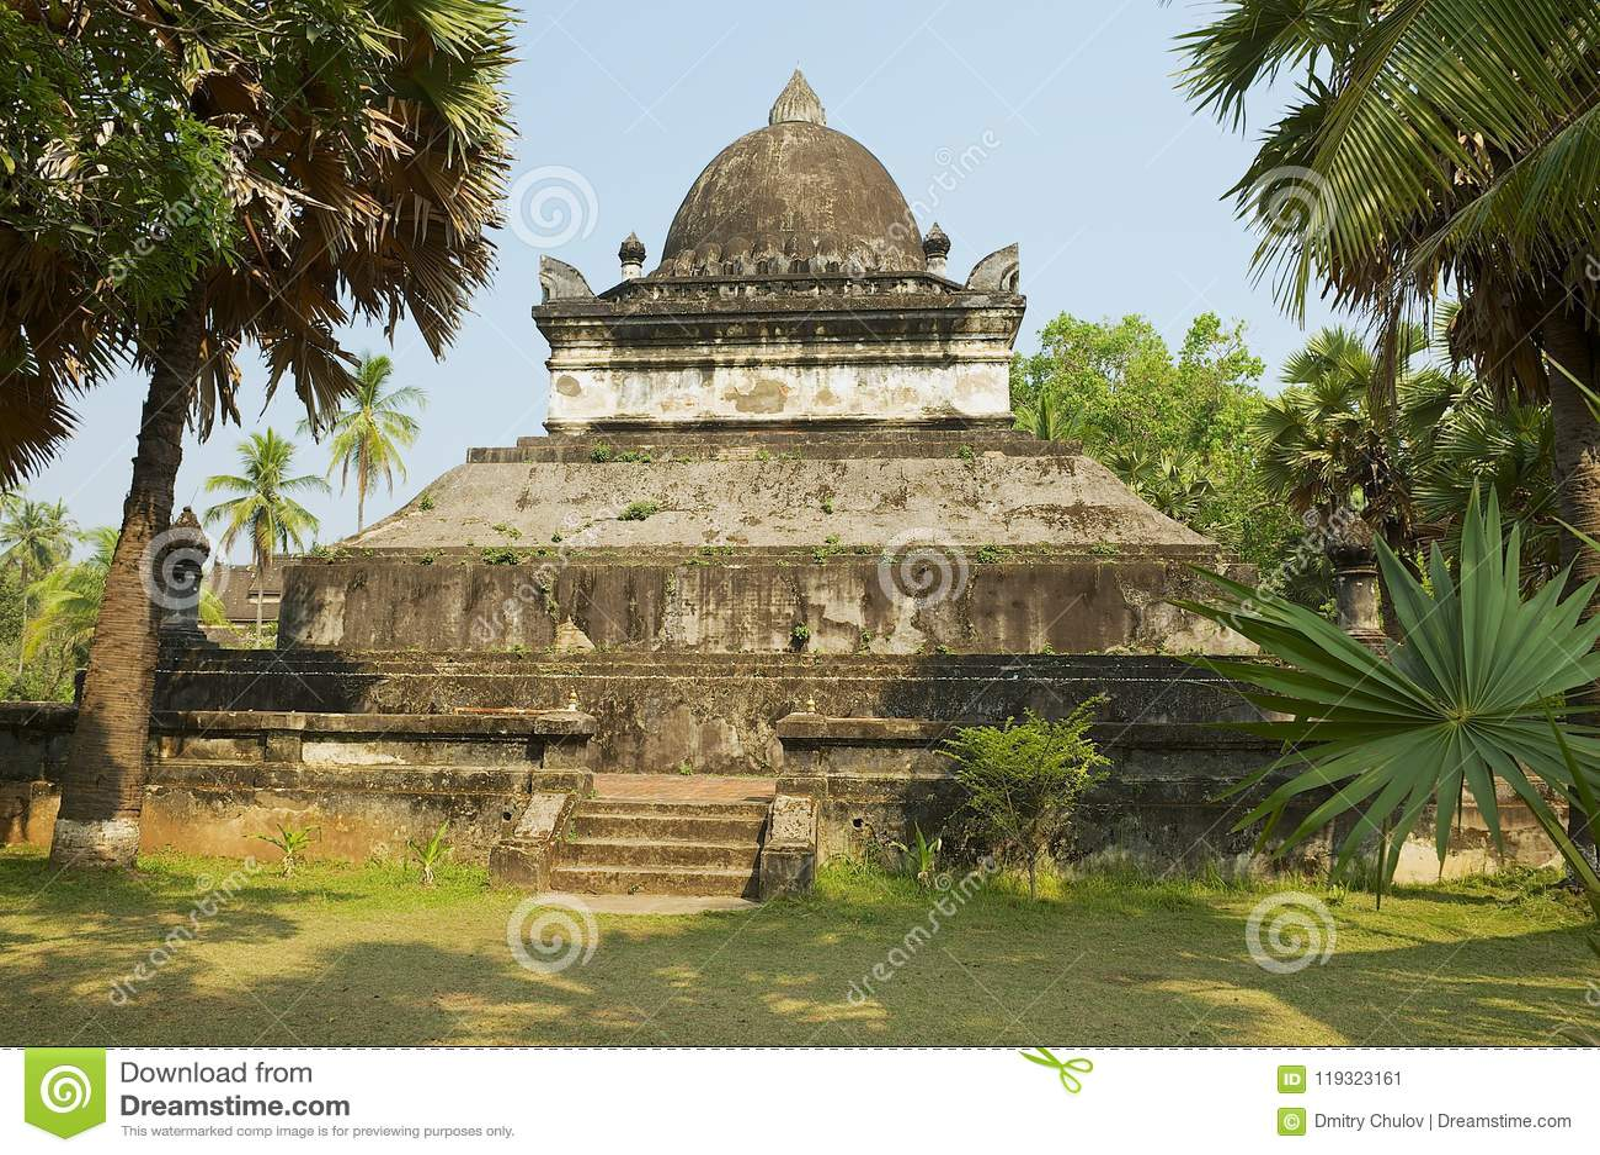 Quello stupa di Mak Mo al tempio di Wat Visounnarath in Luang Prabang, Laos